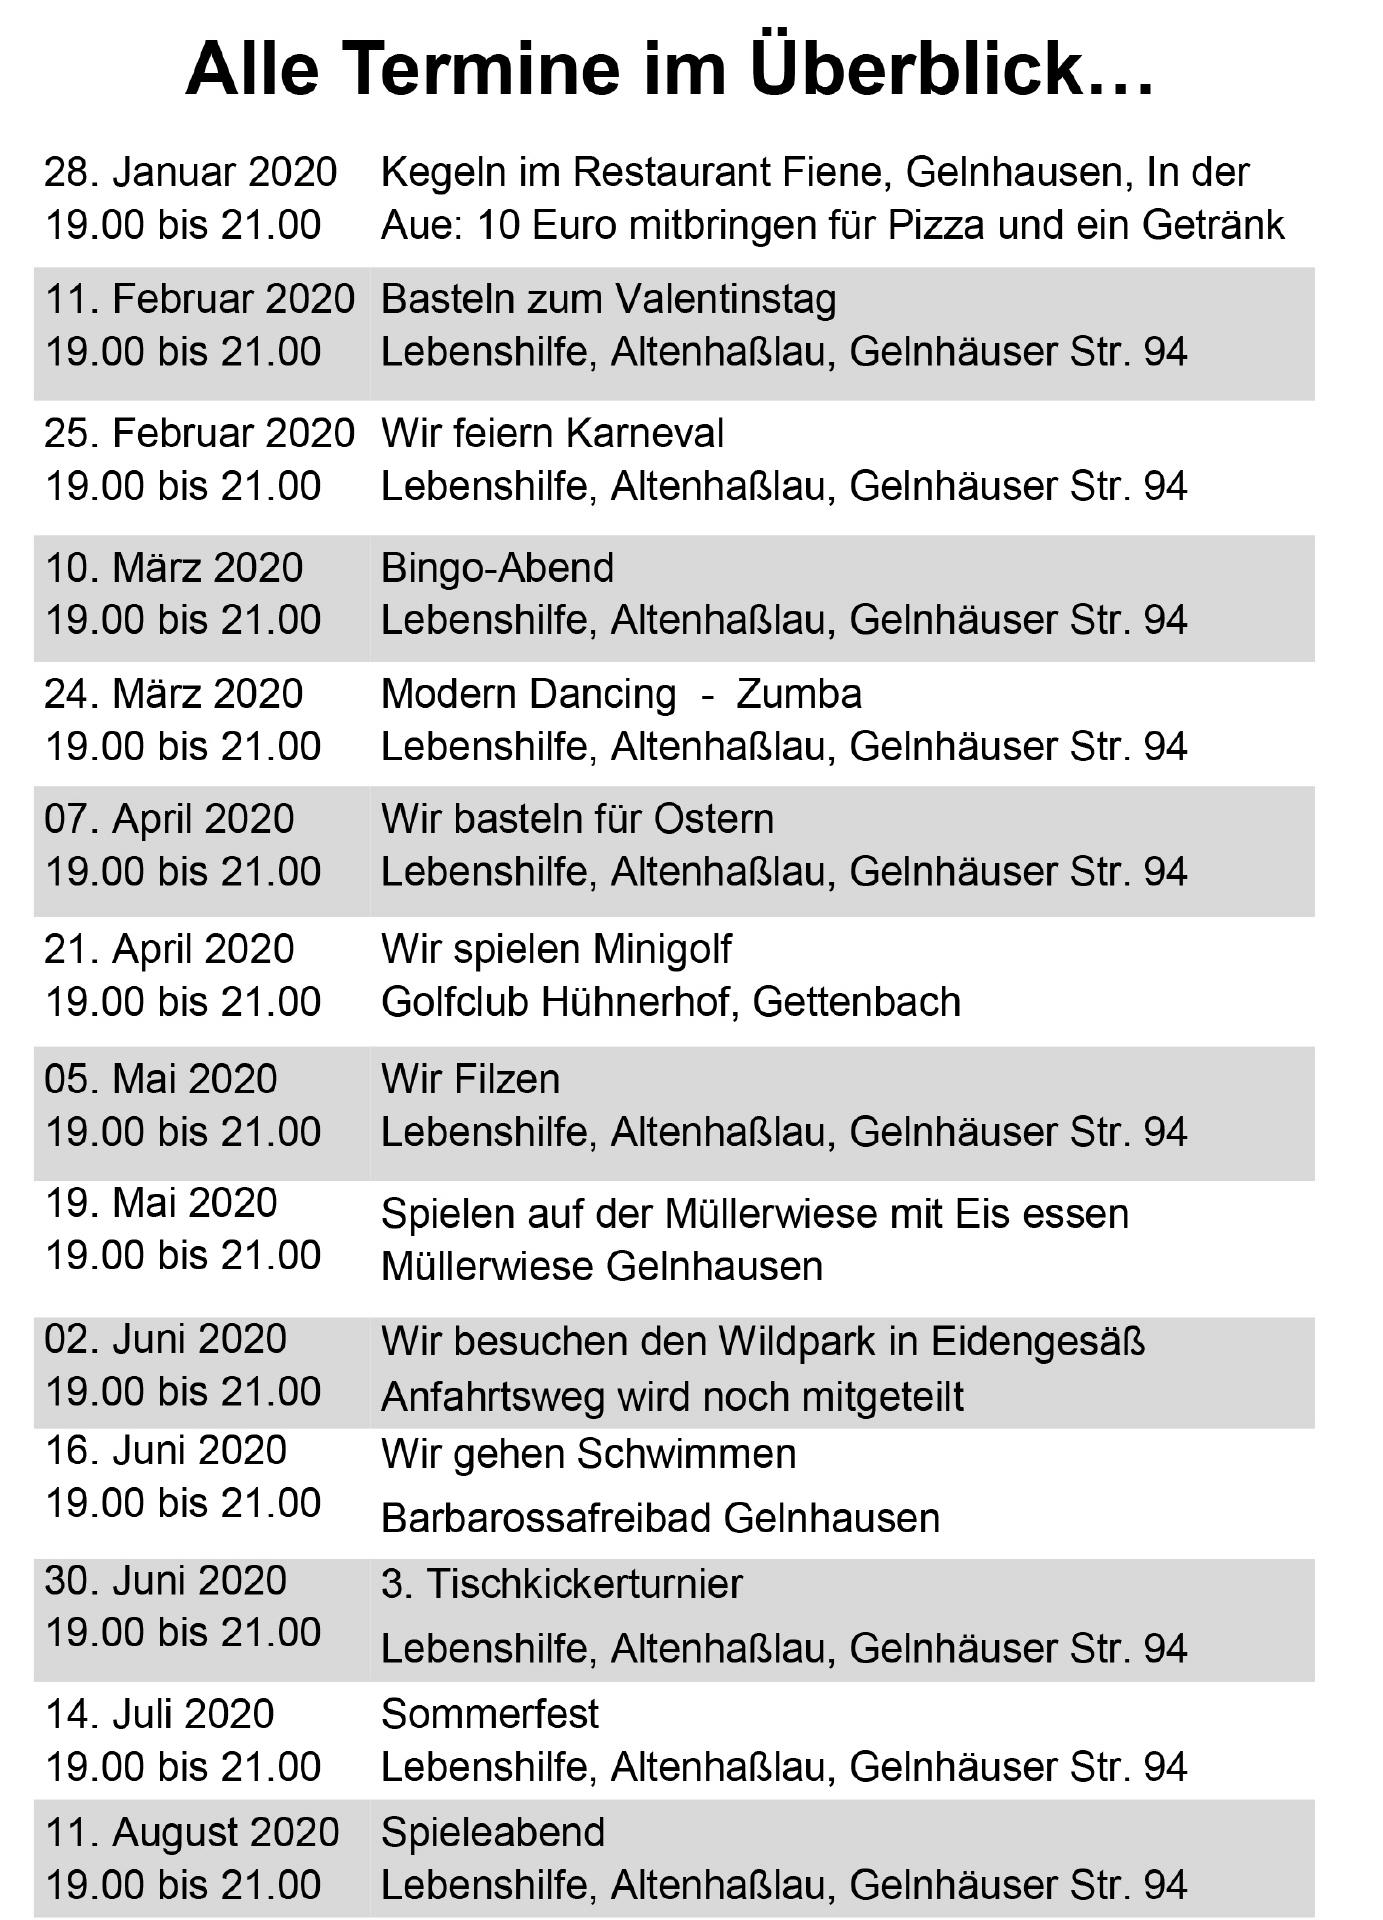 Lebmalprogramm01-12-2020